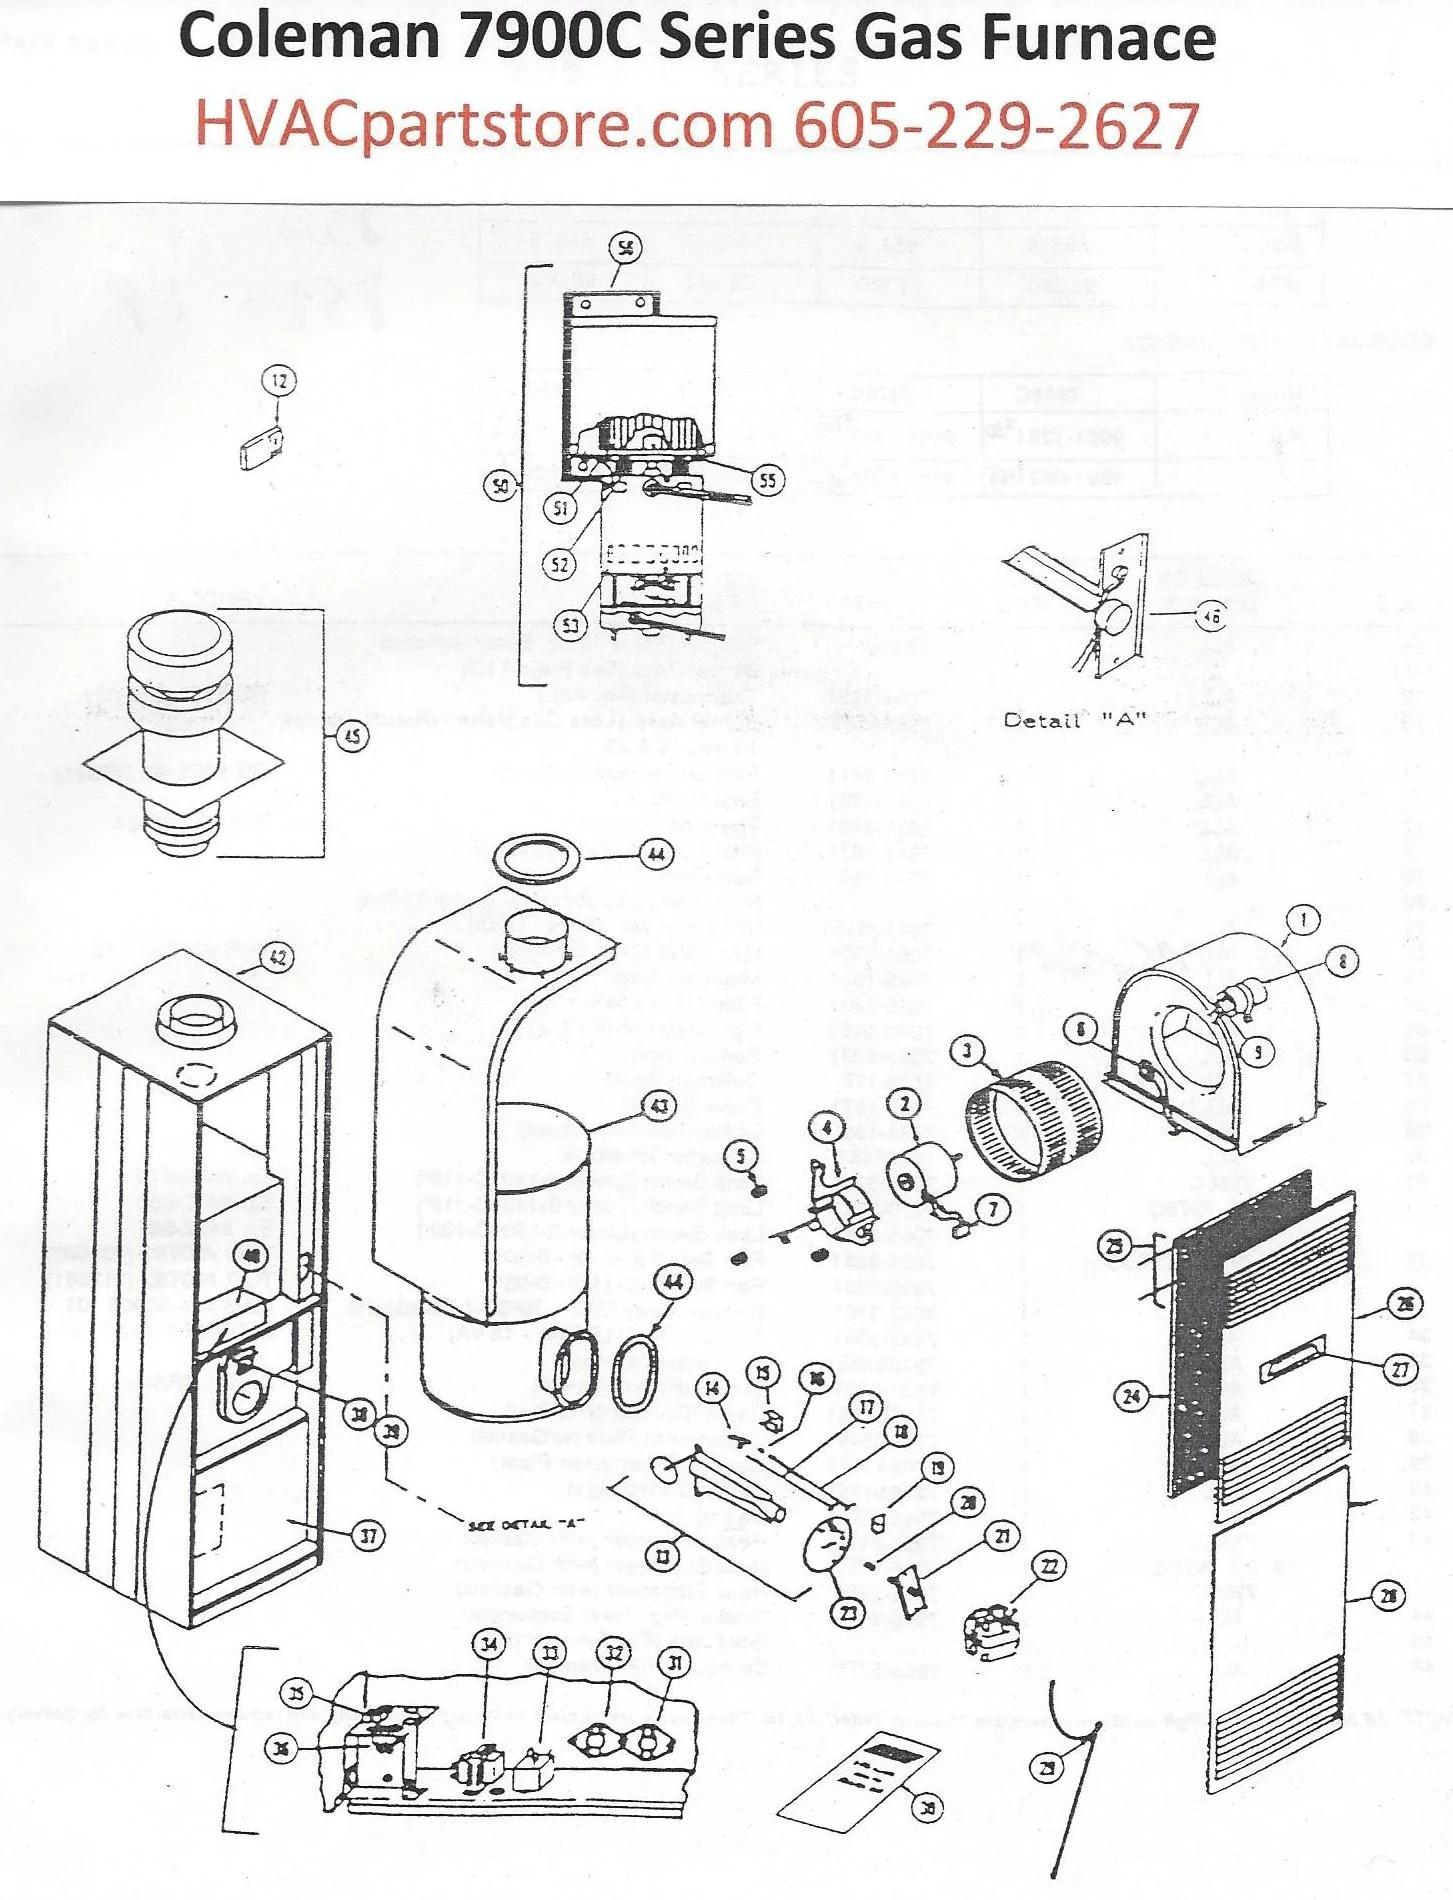 Coleman 7900 Furnace Diagram, Coleman, Get Free Image